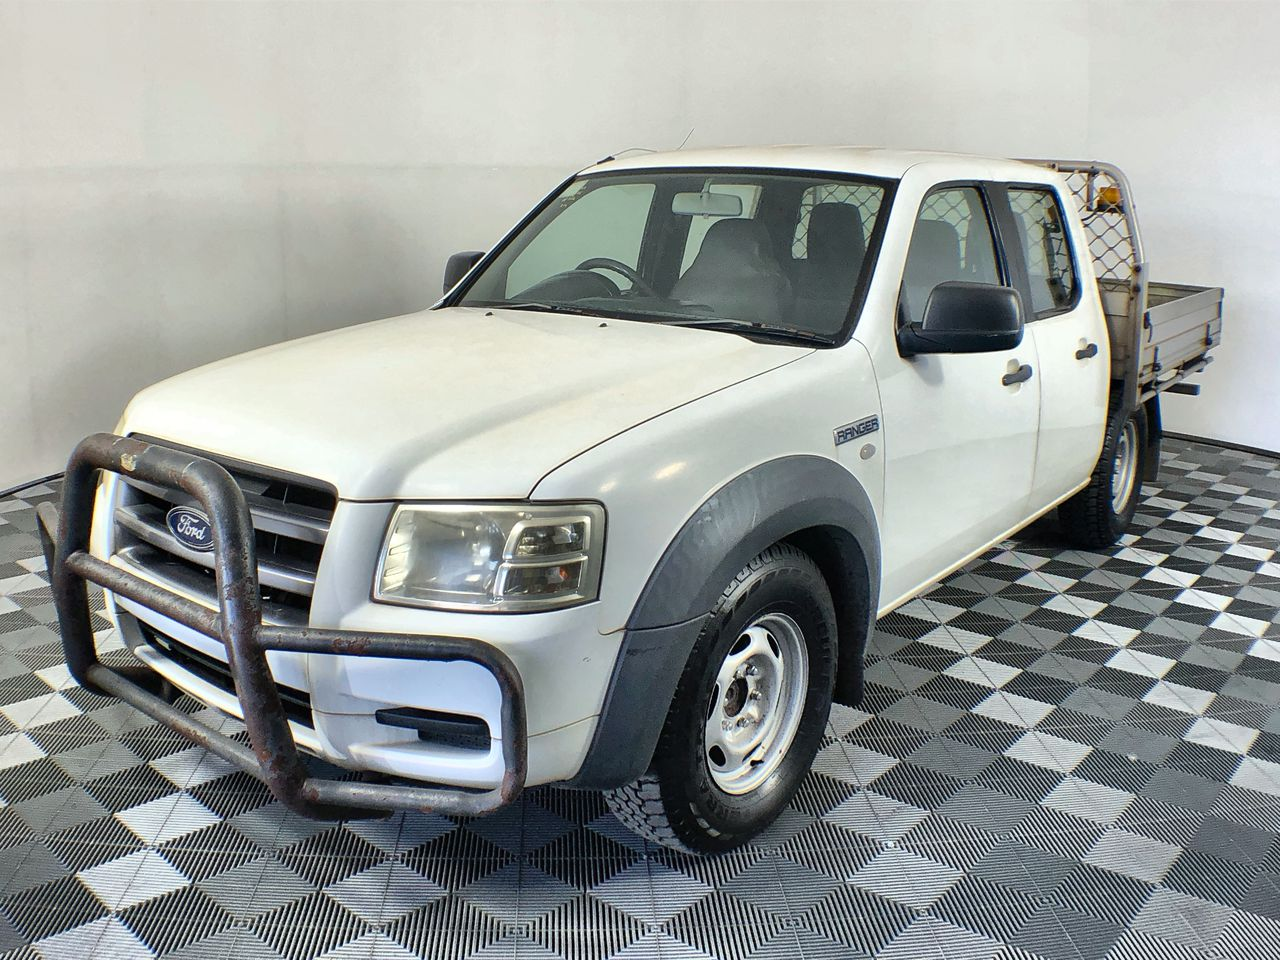 2007 Ford Ranger XL T/Diesel Auto Dual Cab Ute 71,264 kms